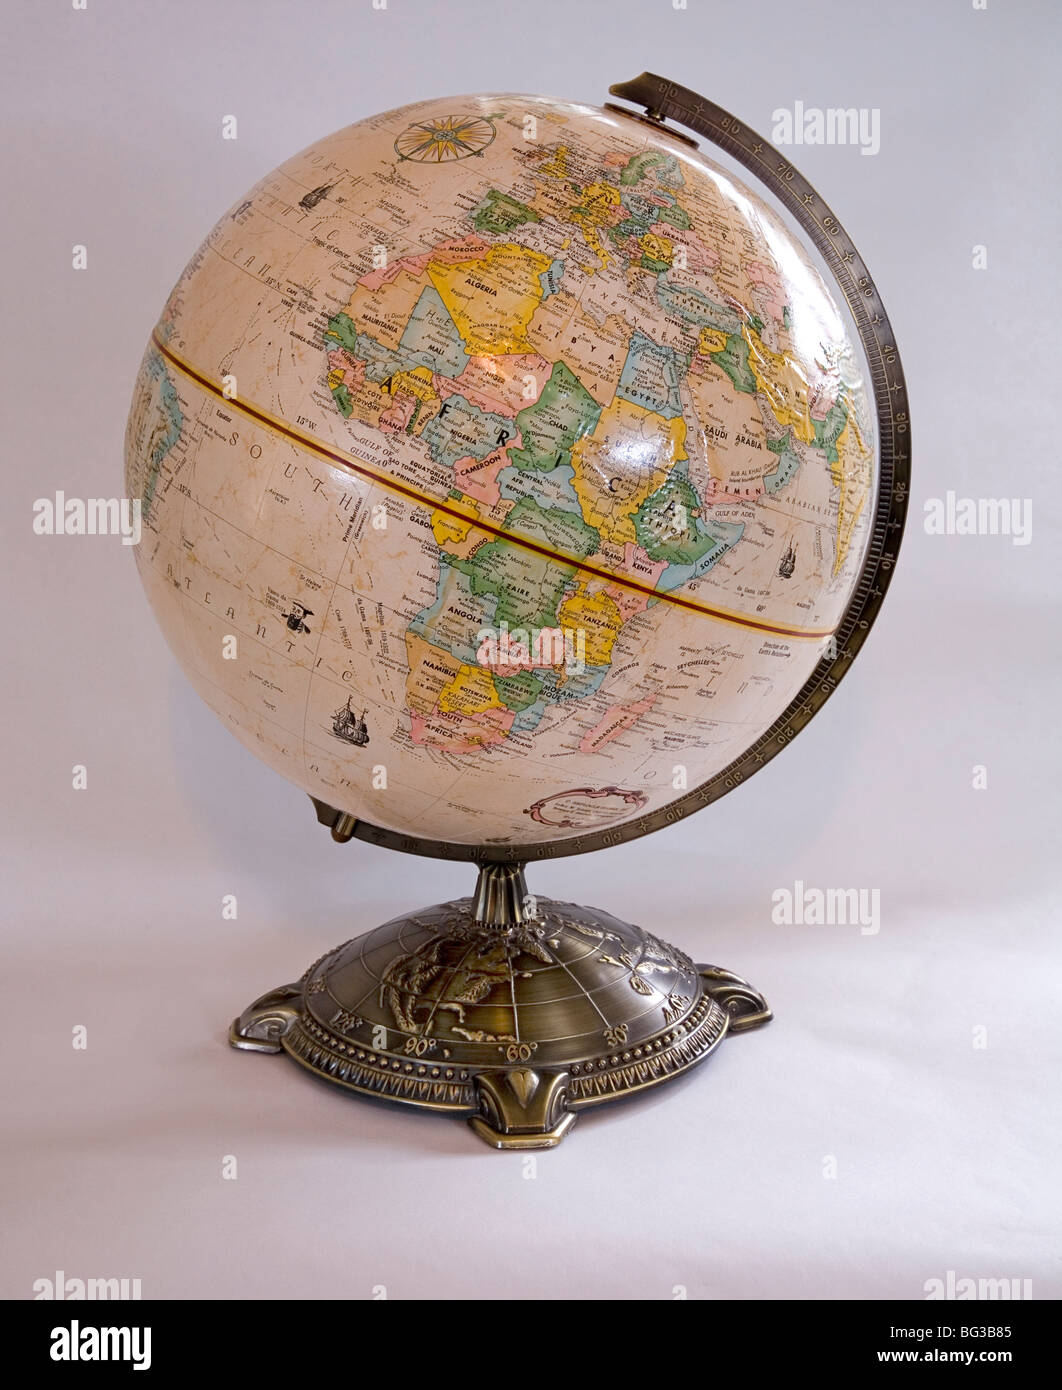 Globe World Earth Map of the World - Stock Image